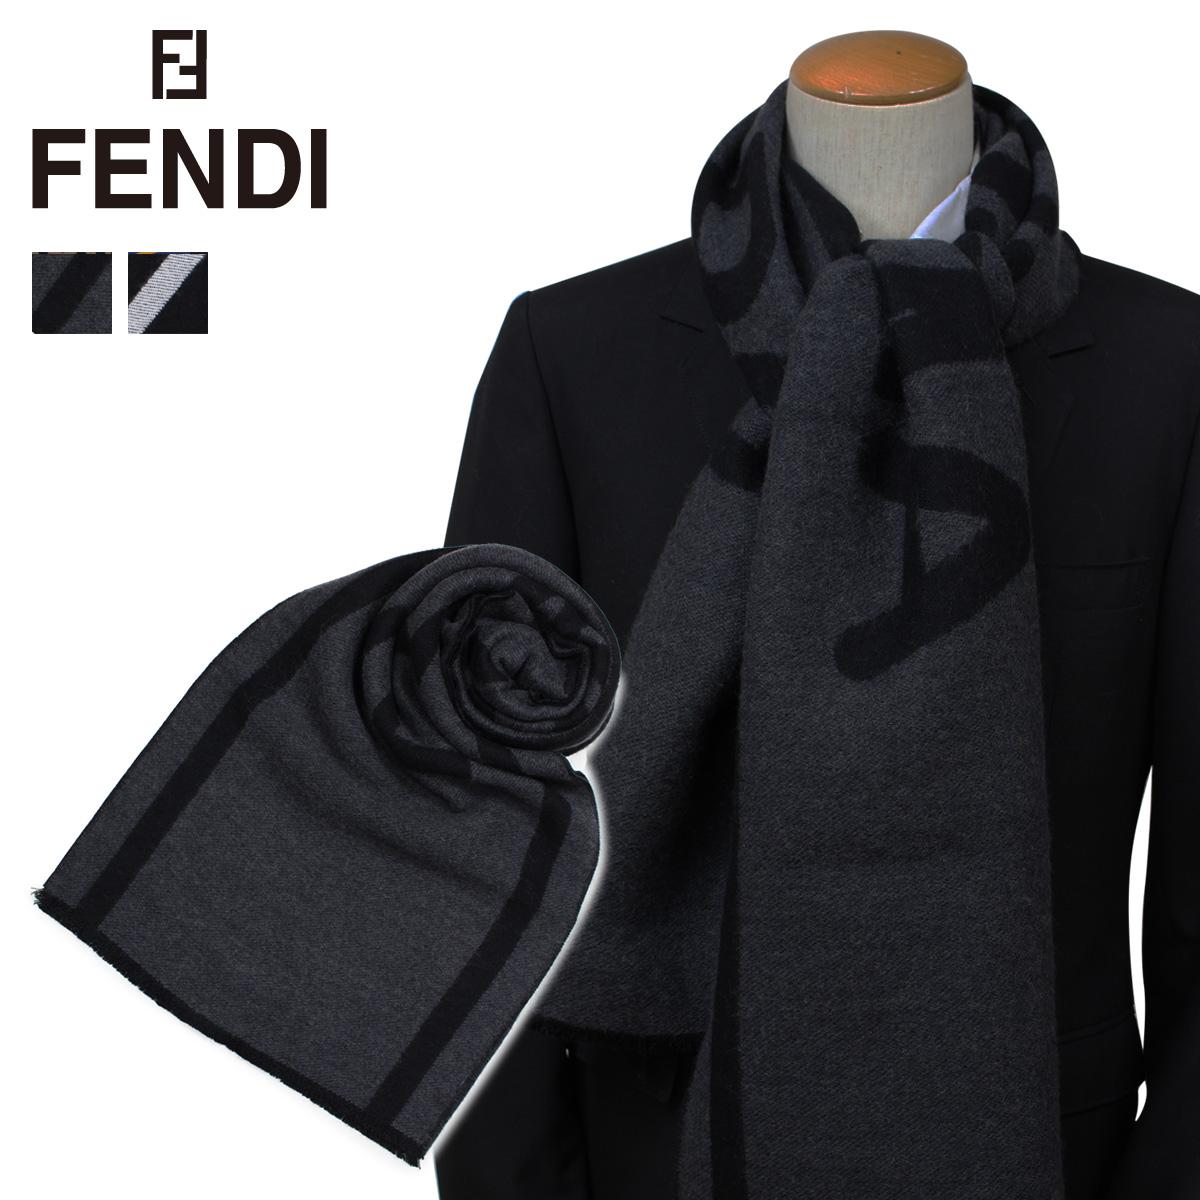 c36e0f352a10 1925年ローマで皮革と毛皮の店を創業したFENDIは、時代と共に革新を繰り返すラグジュアリーブランド。八十余年の間、ファッションの表舞台で常に脚光を浴びるFENDIを  ...